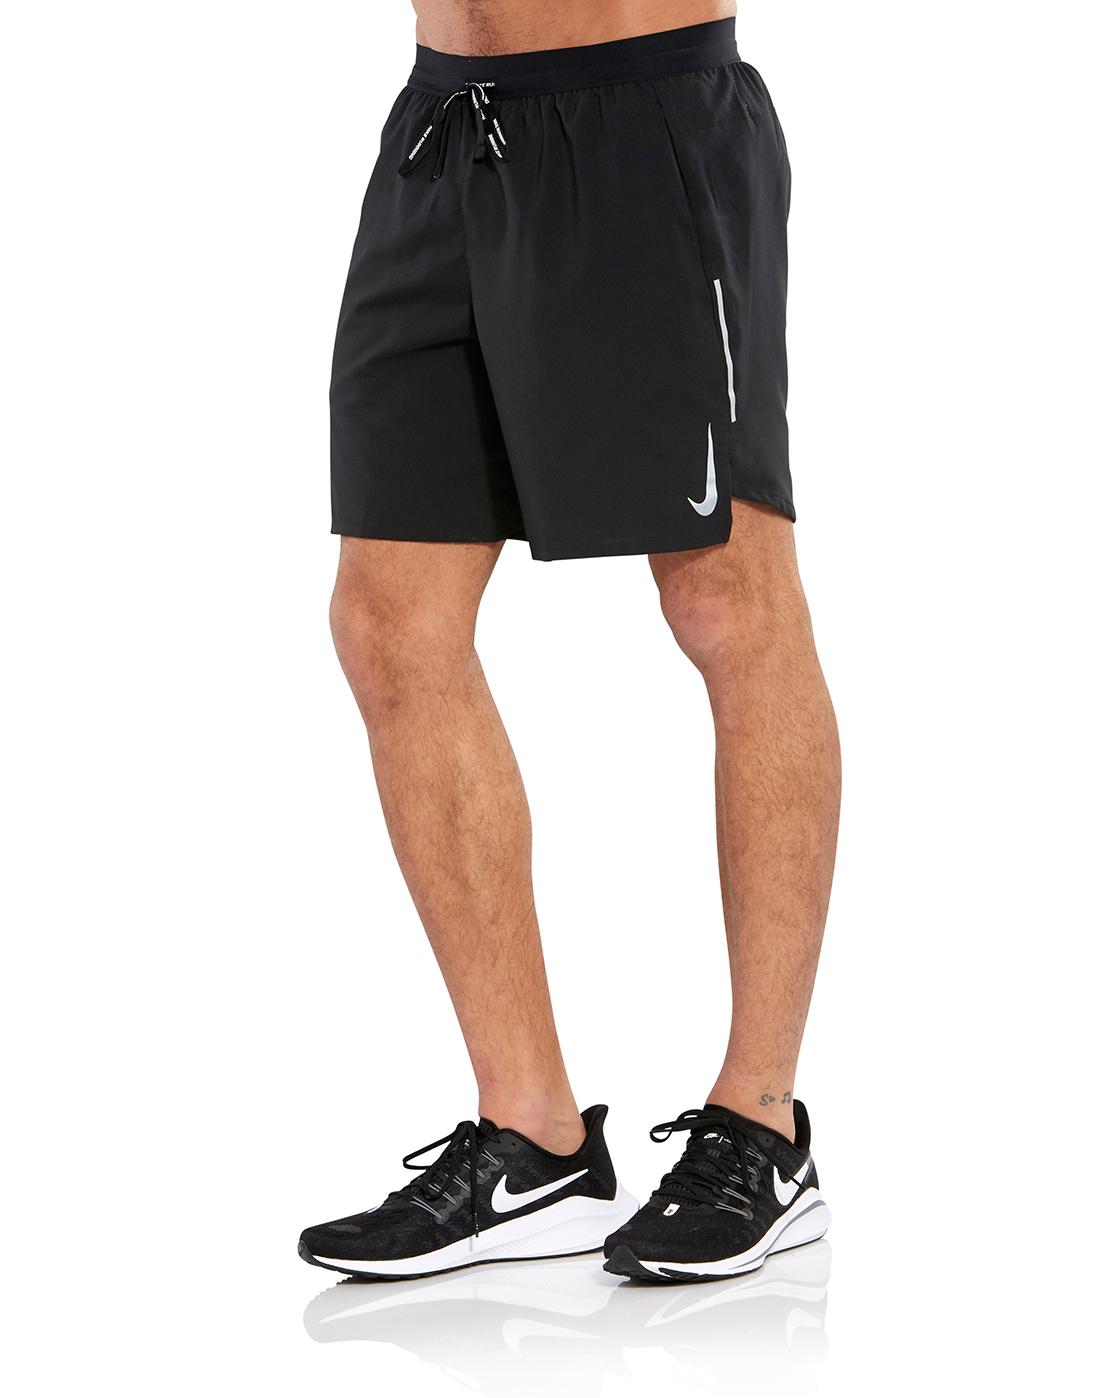 8b70034336a2 Men s Black Nike Flex Stride Running Shorts